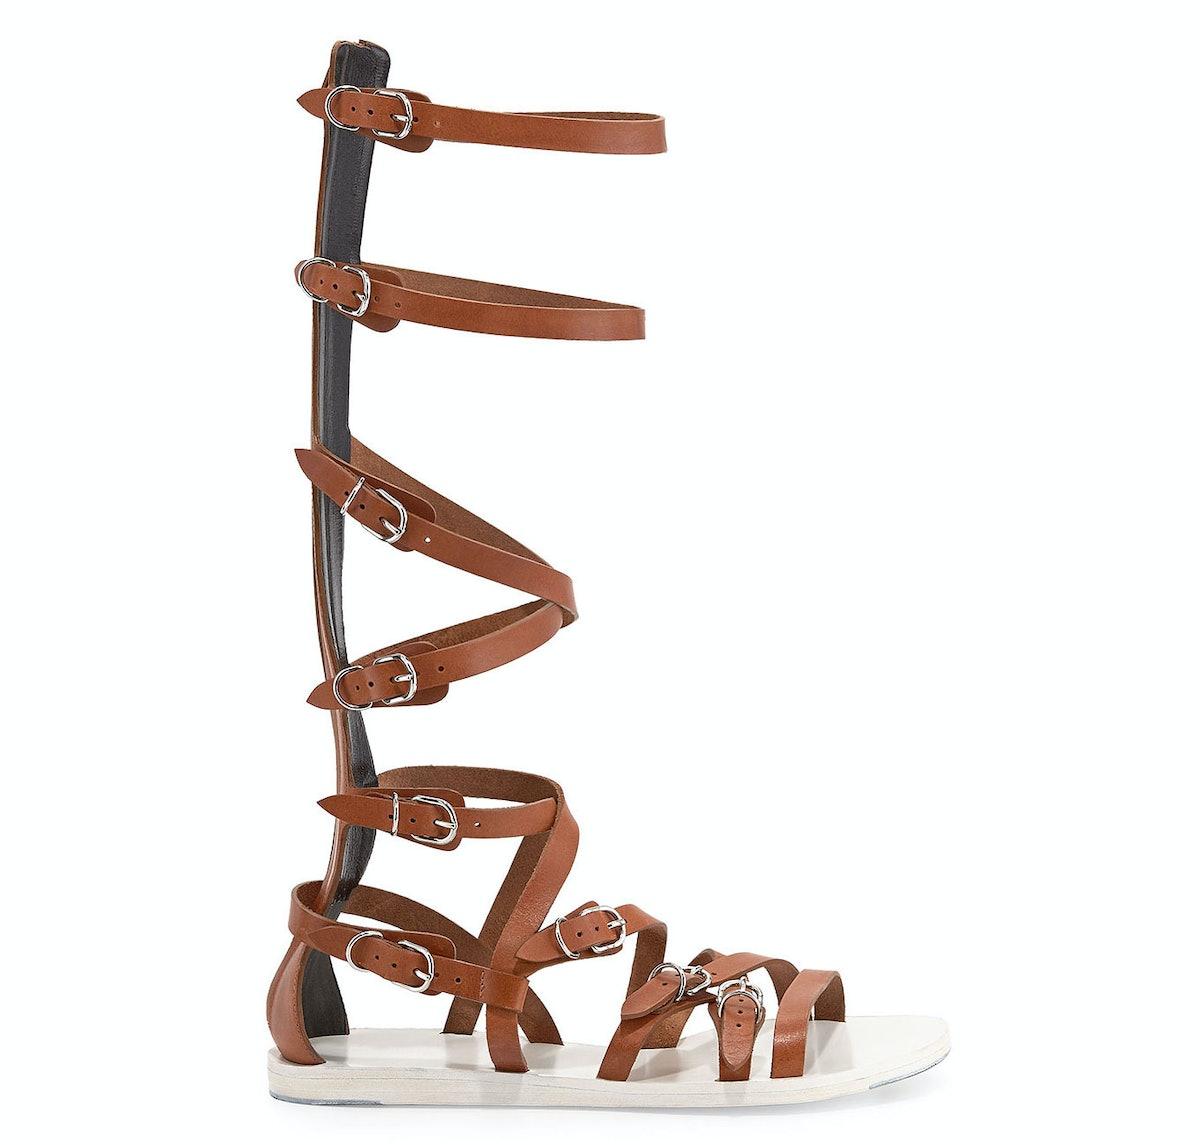 Balenciaga gladiator sandals